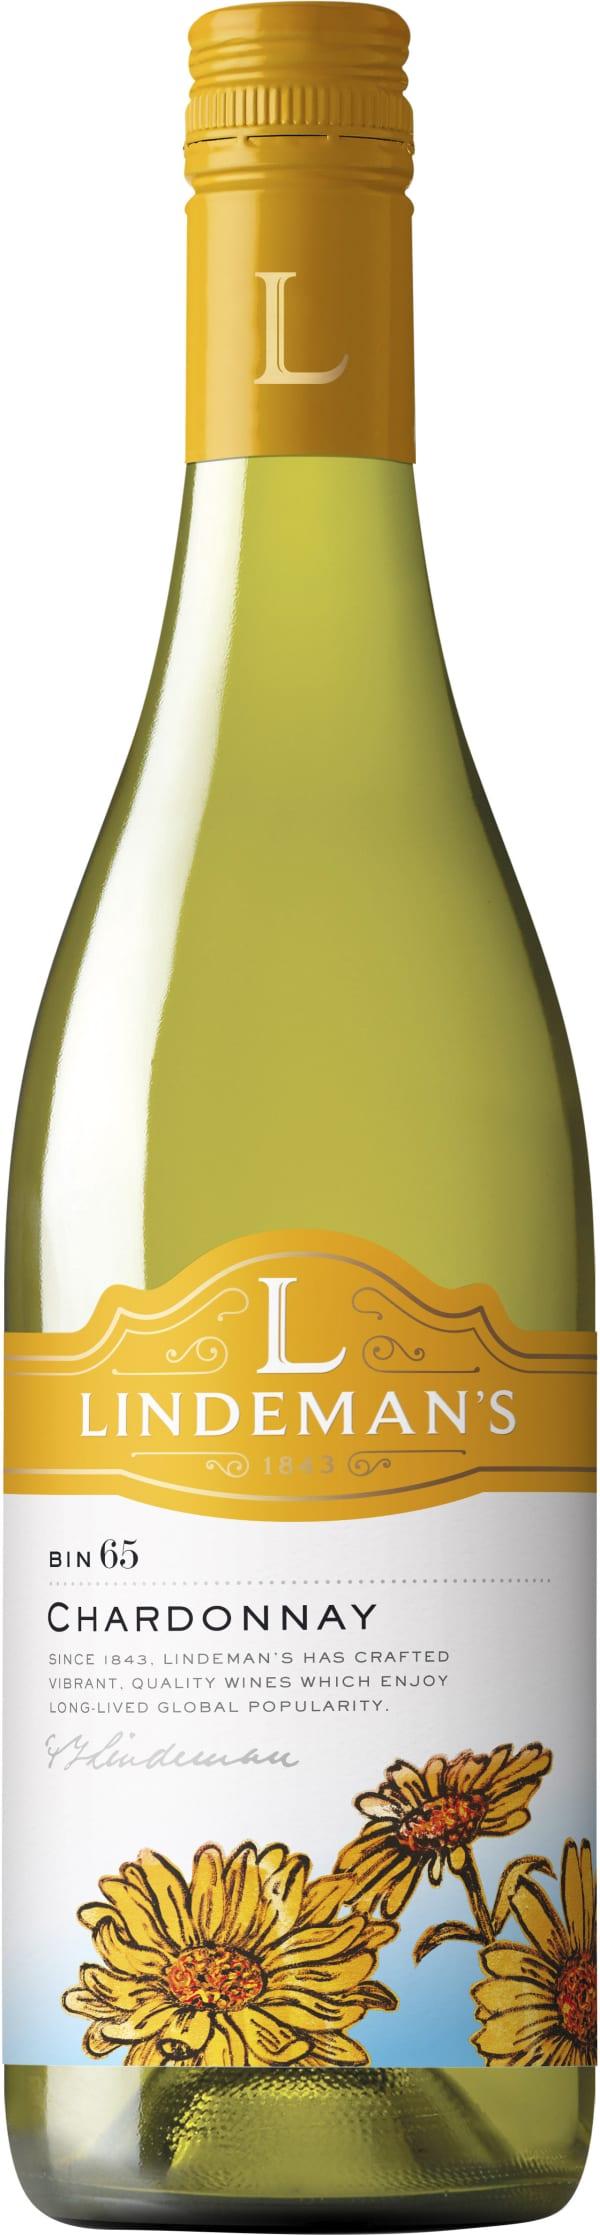 Lindemans Bin 65 Chardonnay 2016